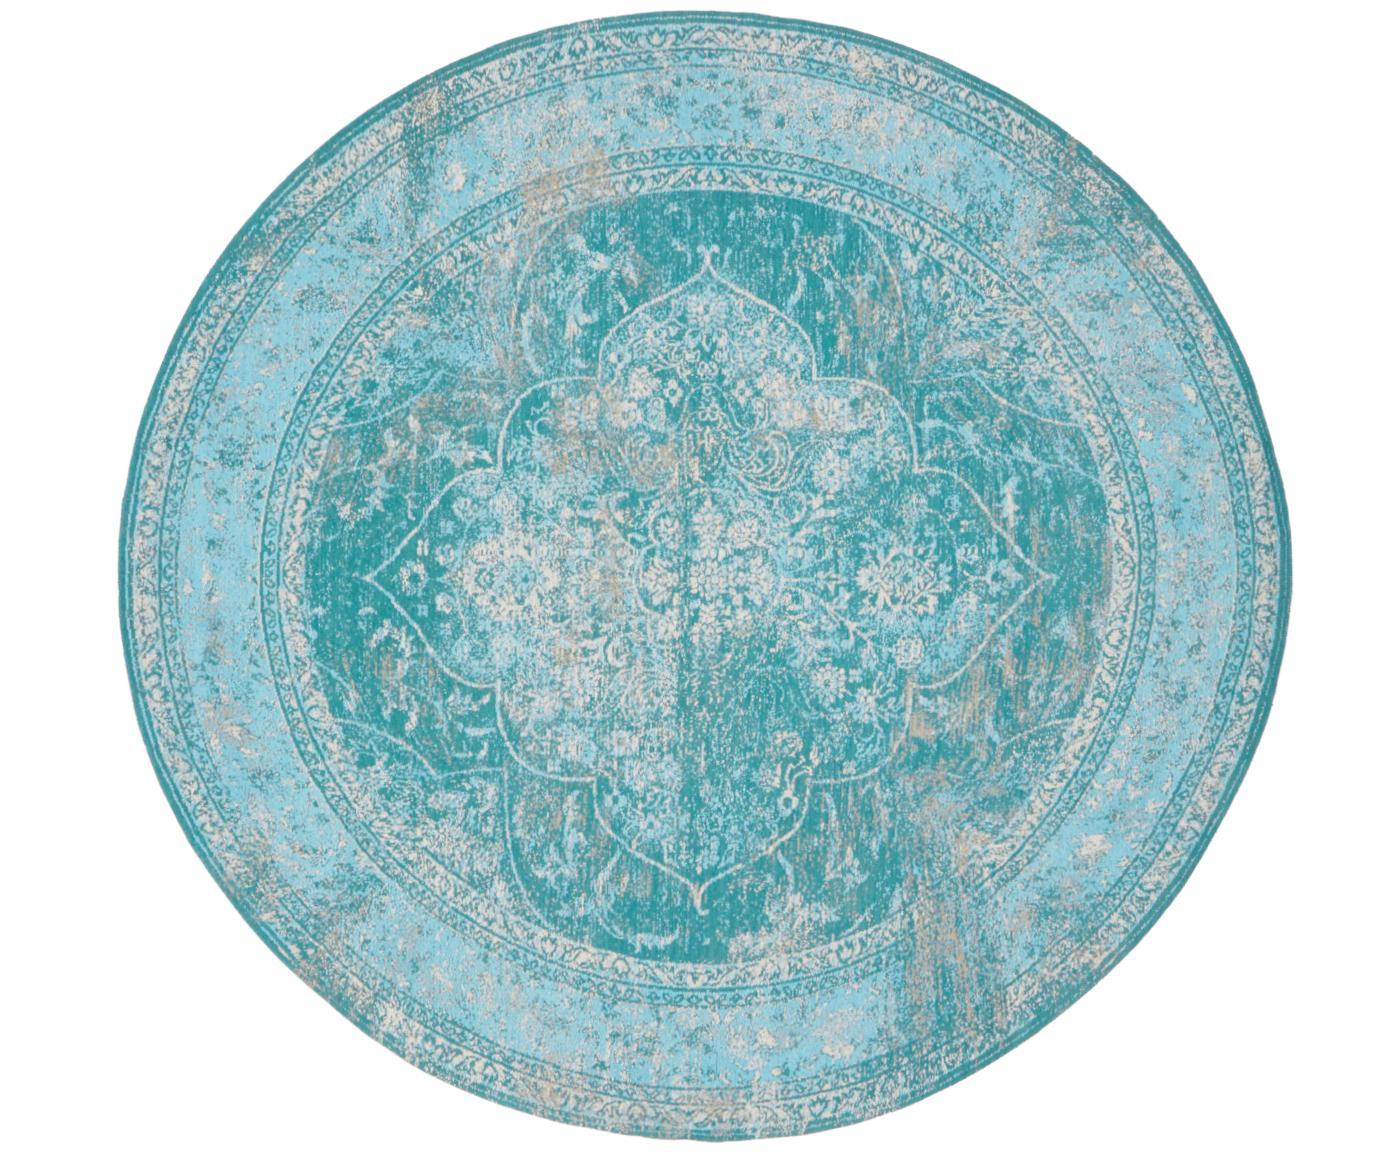 Vintage Chenille vloerkleed Palermo in turquoise, Bovenzijde: 95% katoen, 5% polyester, Onderzijde: 100% katoen, Turquoise, lichtblauw, crèmekleurig, Ø 150 cm